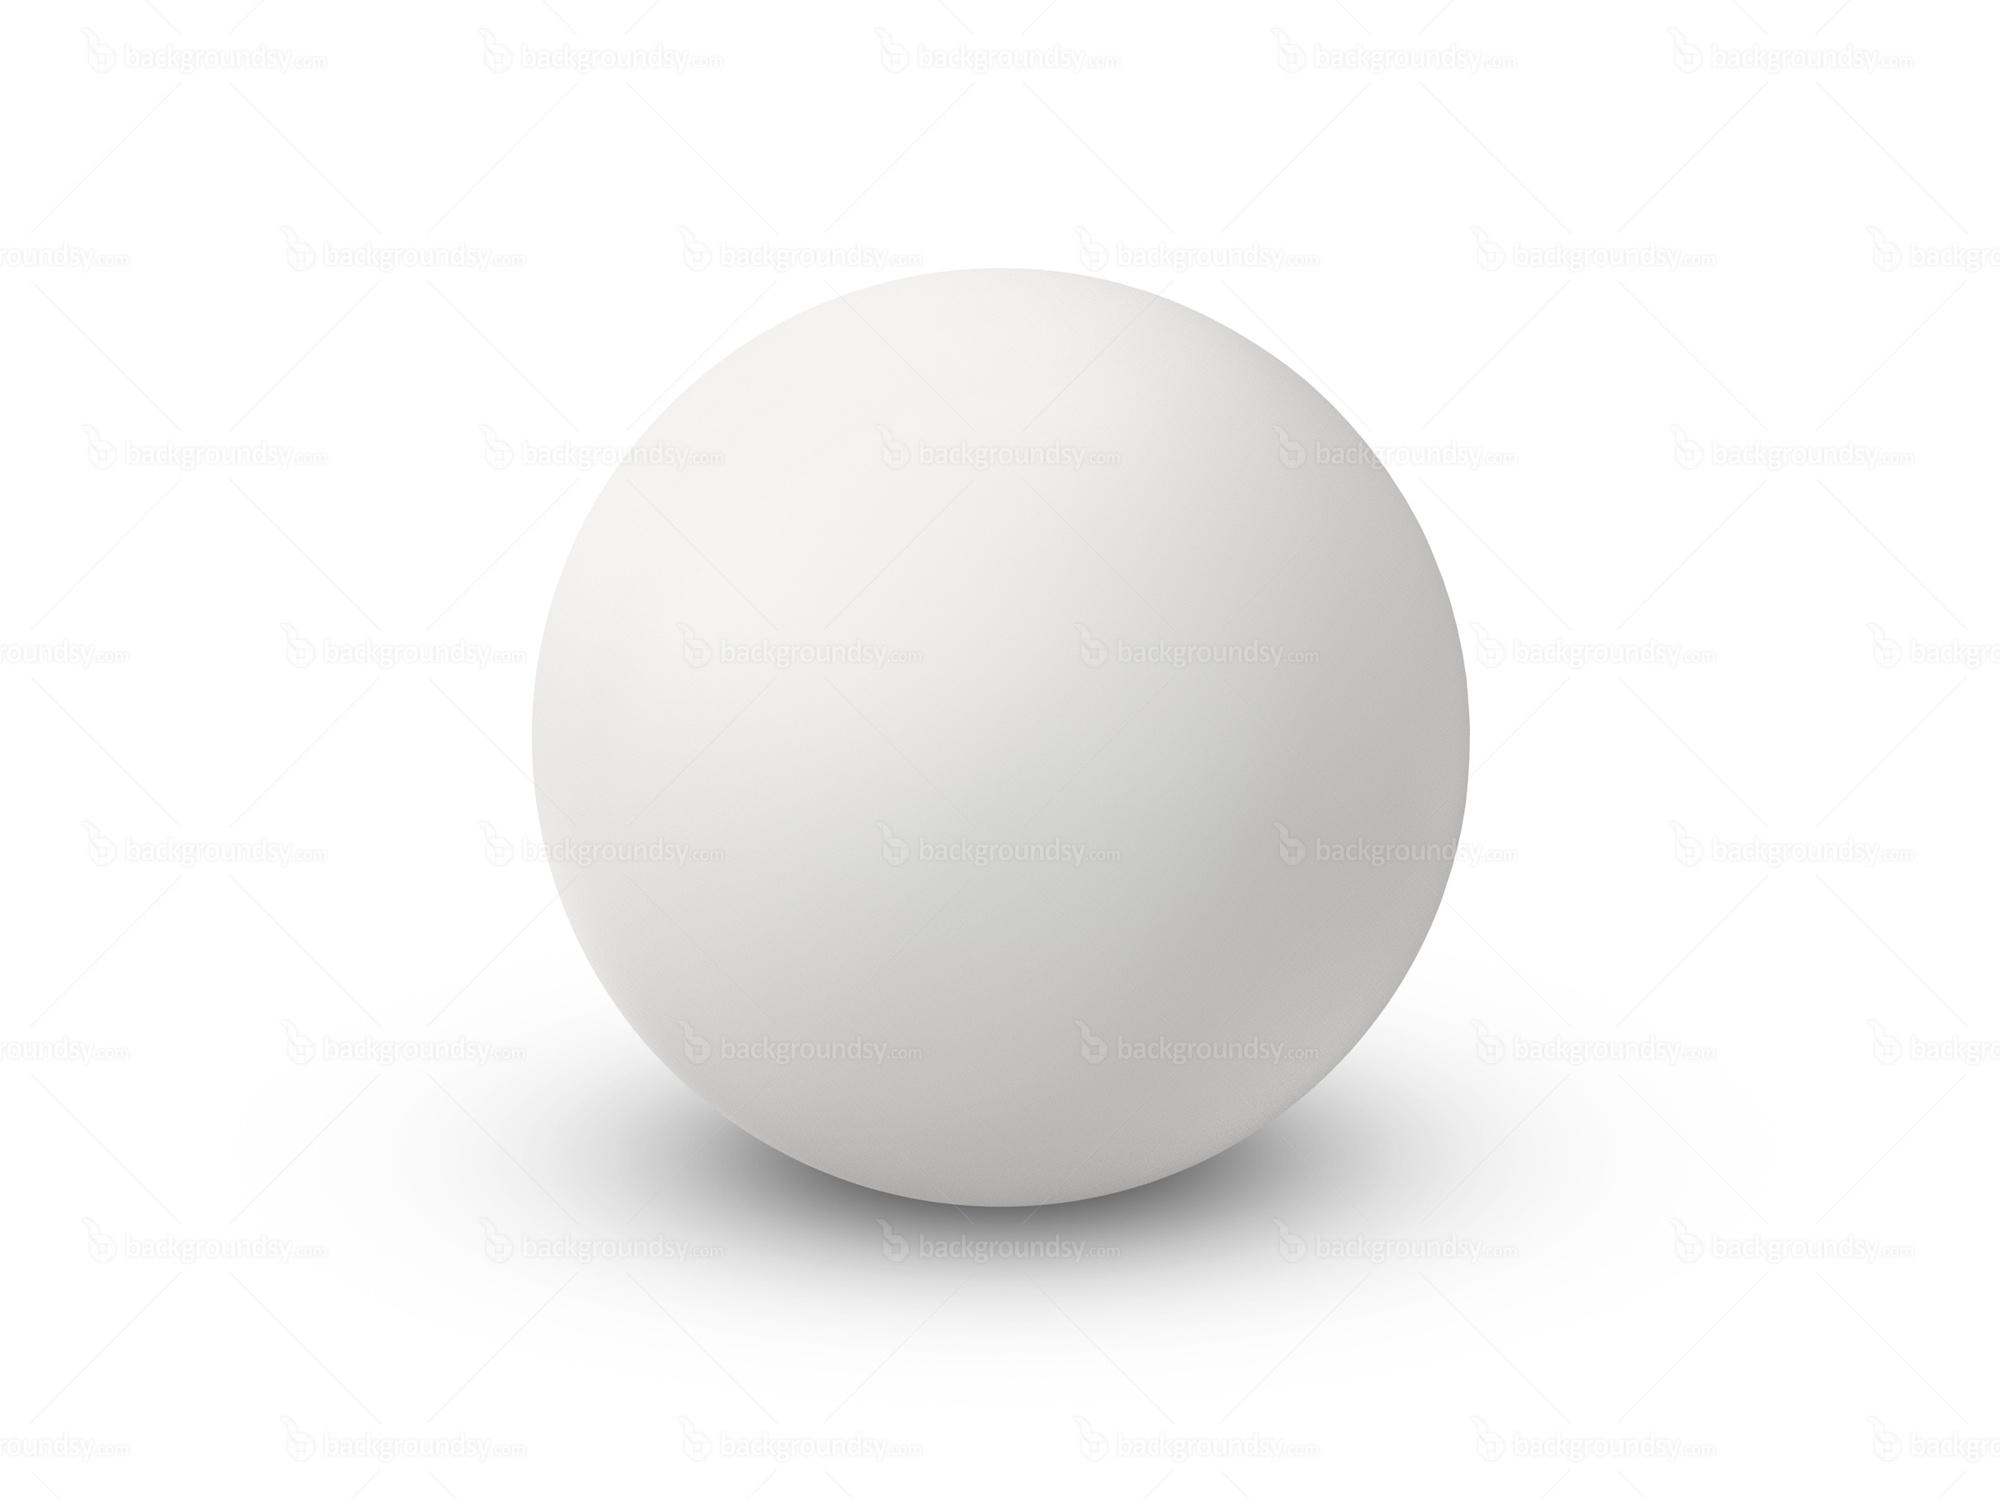 Matte White Sphere Backgroundsy Com